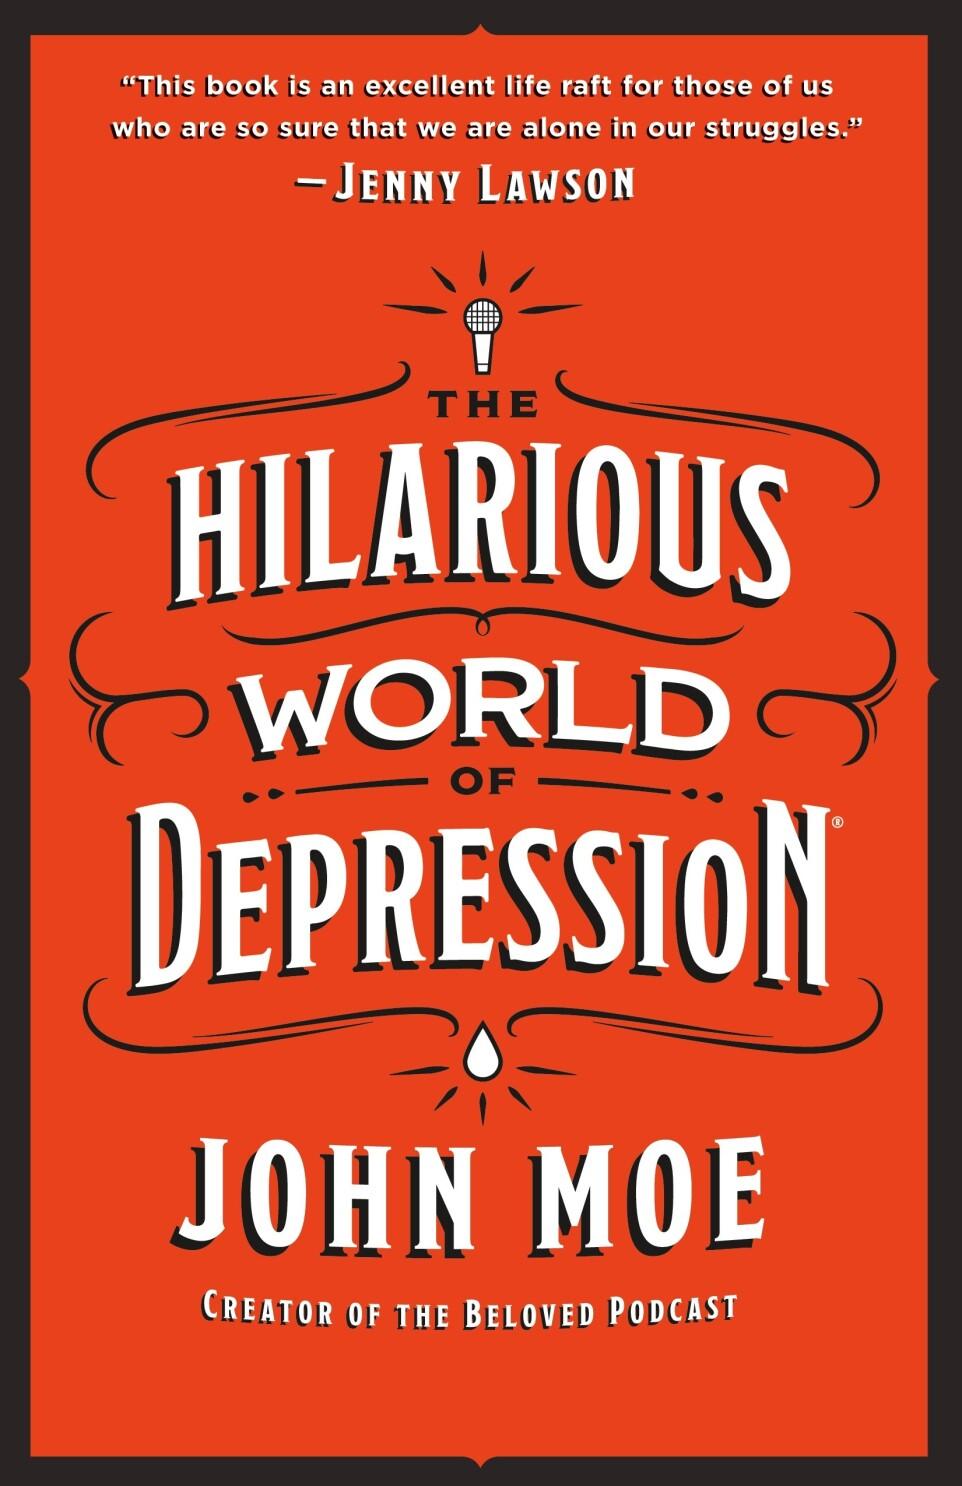 John Moe on his memoir, 'The Hilarious World of Depression' - Los ...